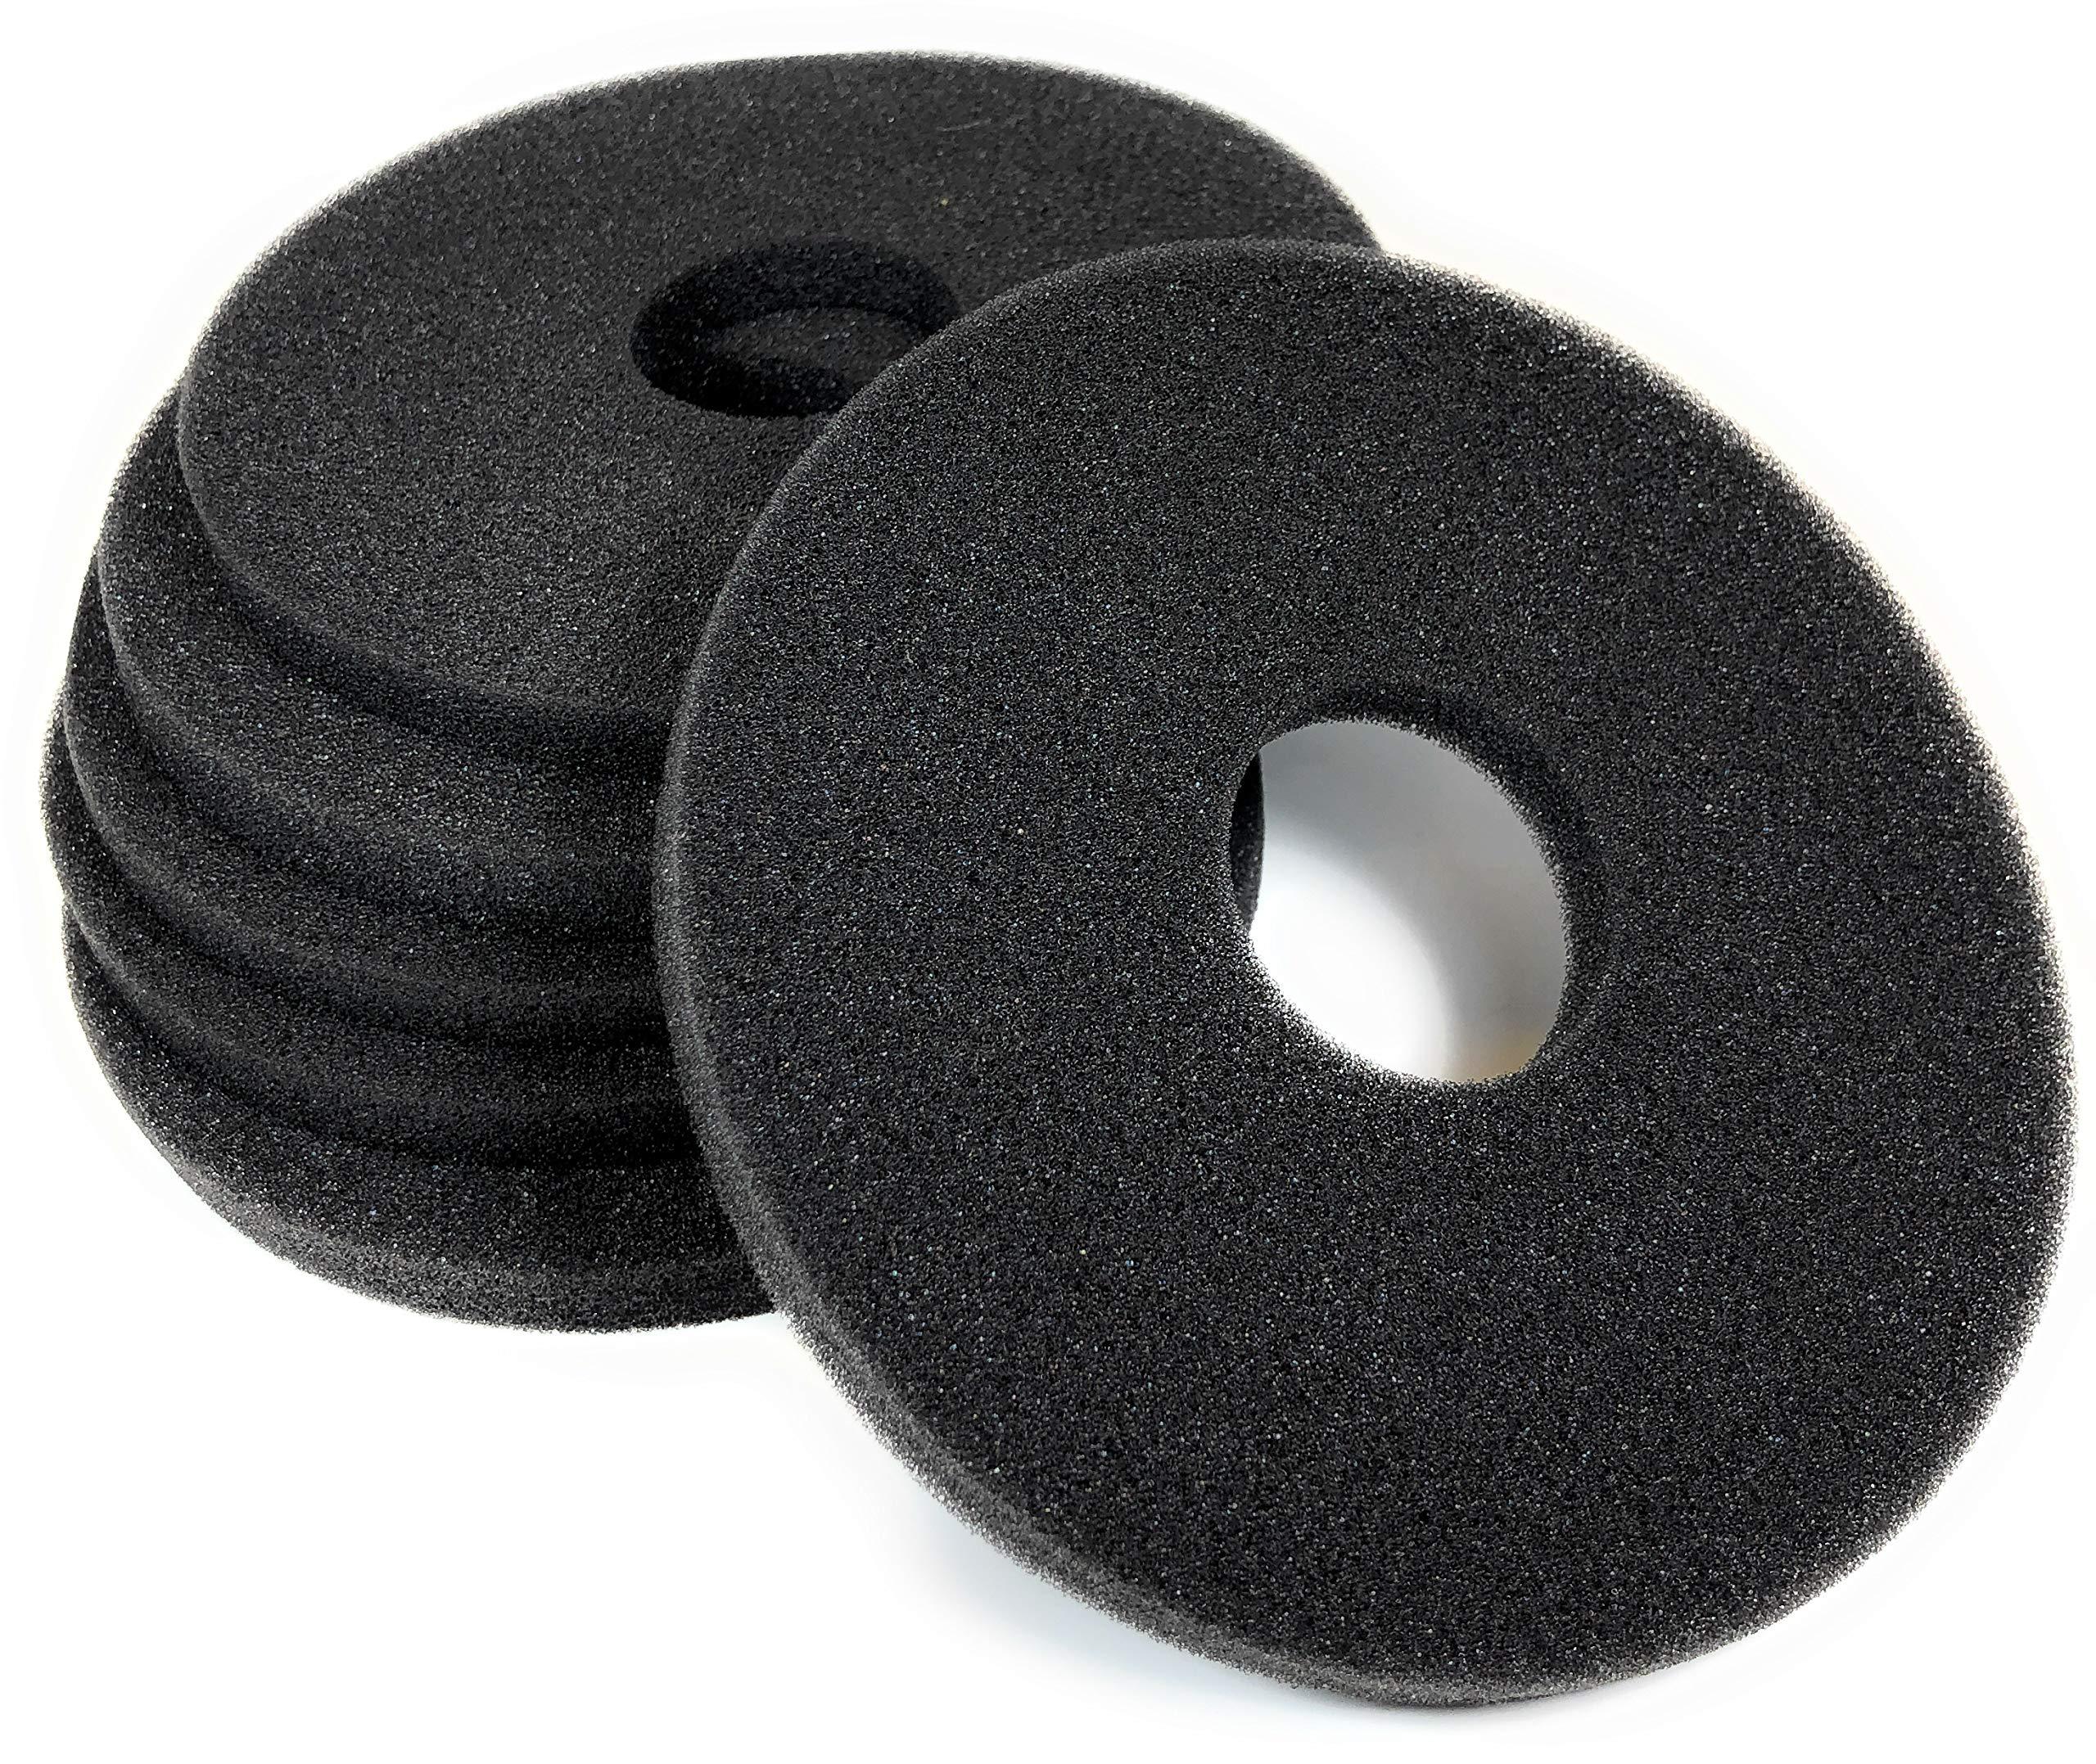 Margarita Salt Glass Bar Rimmer Replacement Sponges Set of 6, Black by SUMMIT Salt Rimmer Replacement Sponges